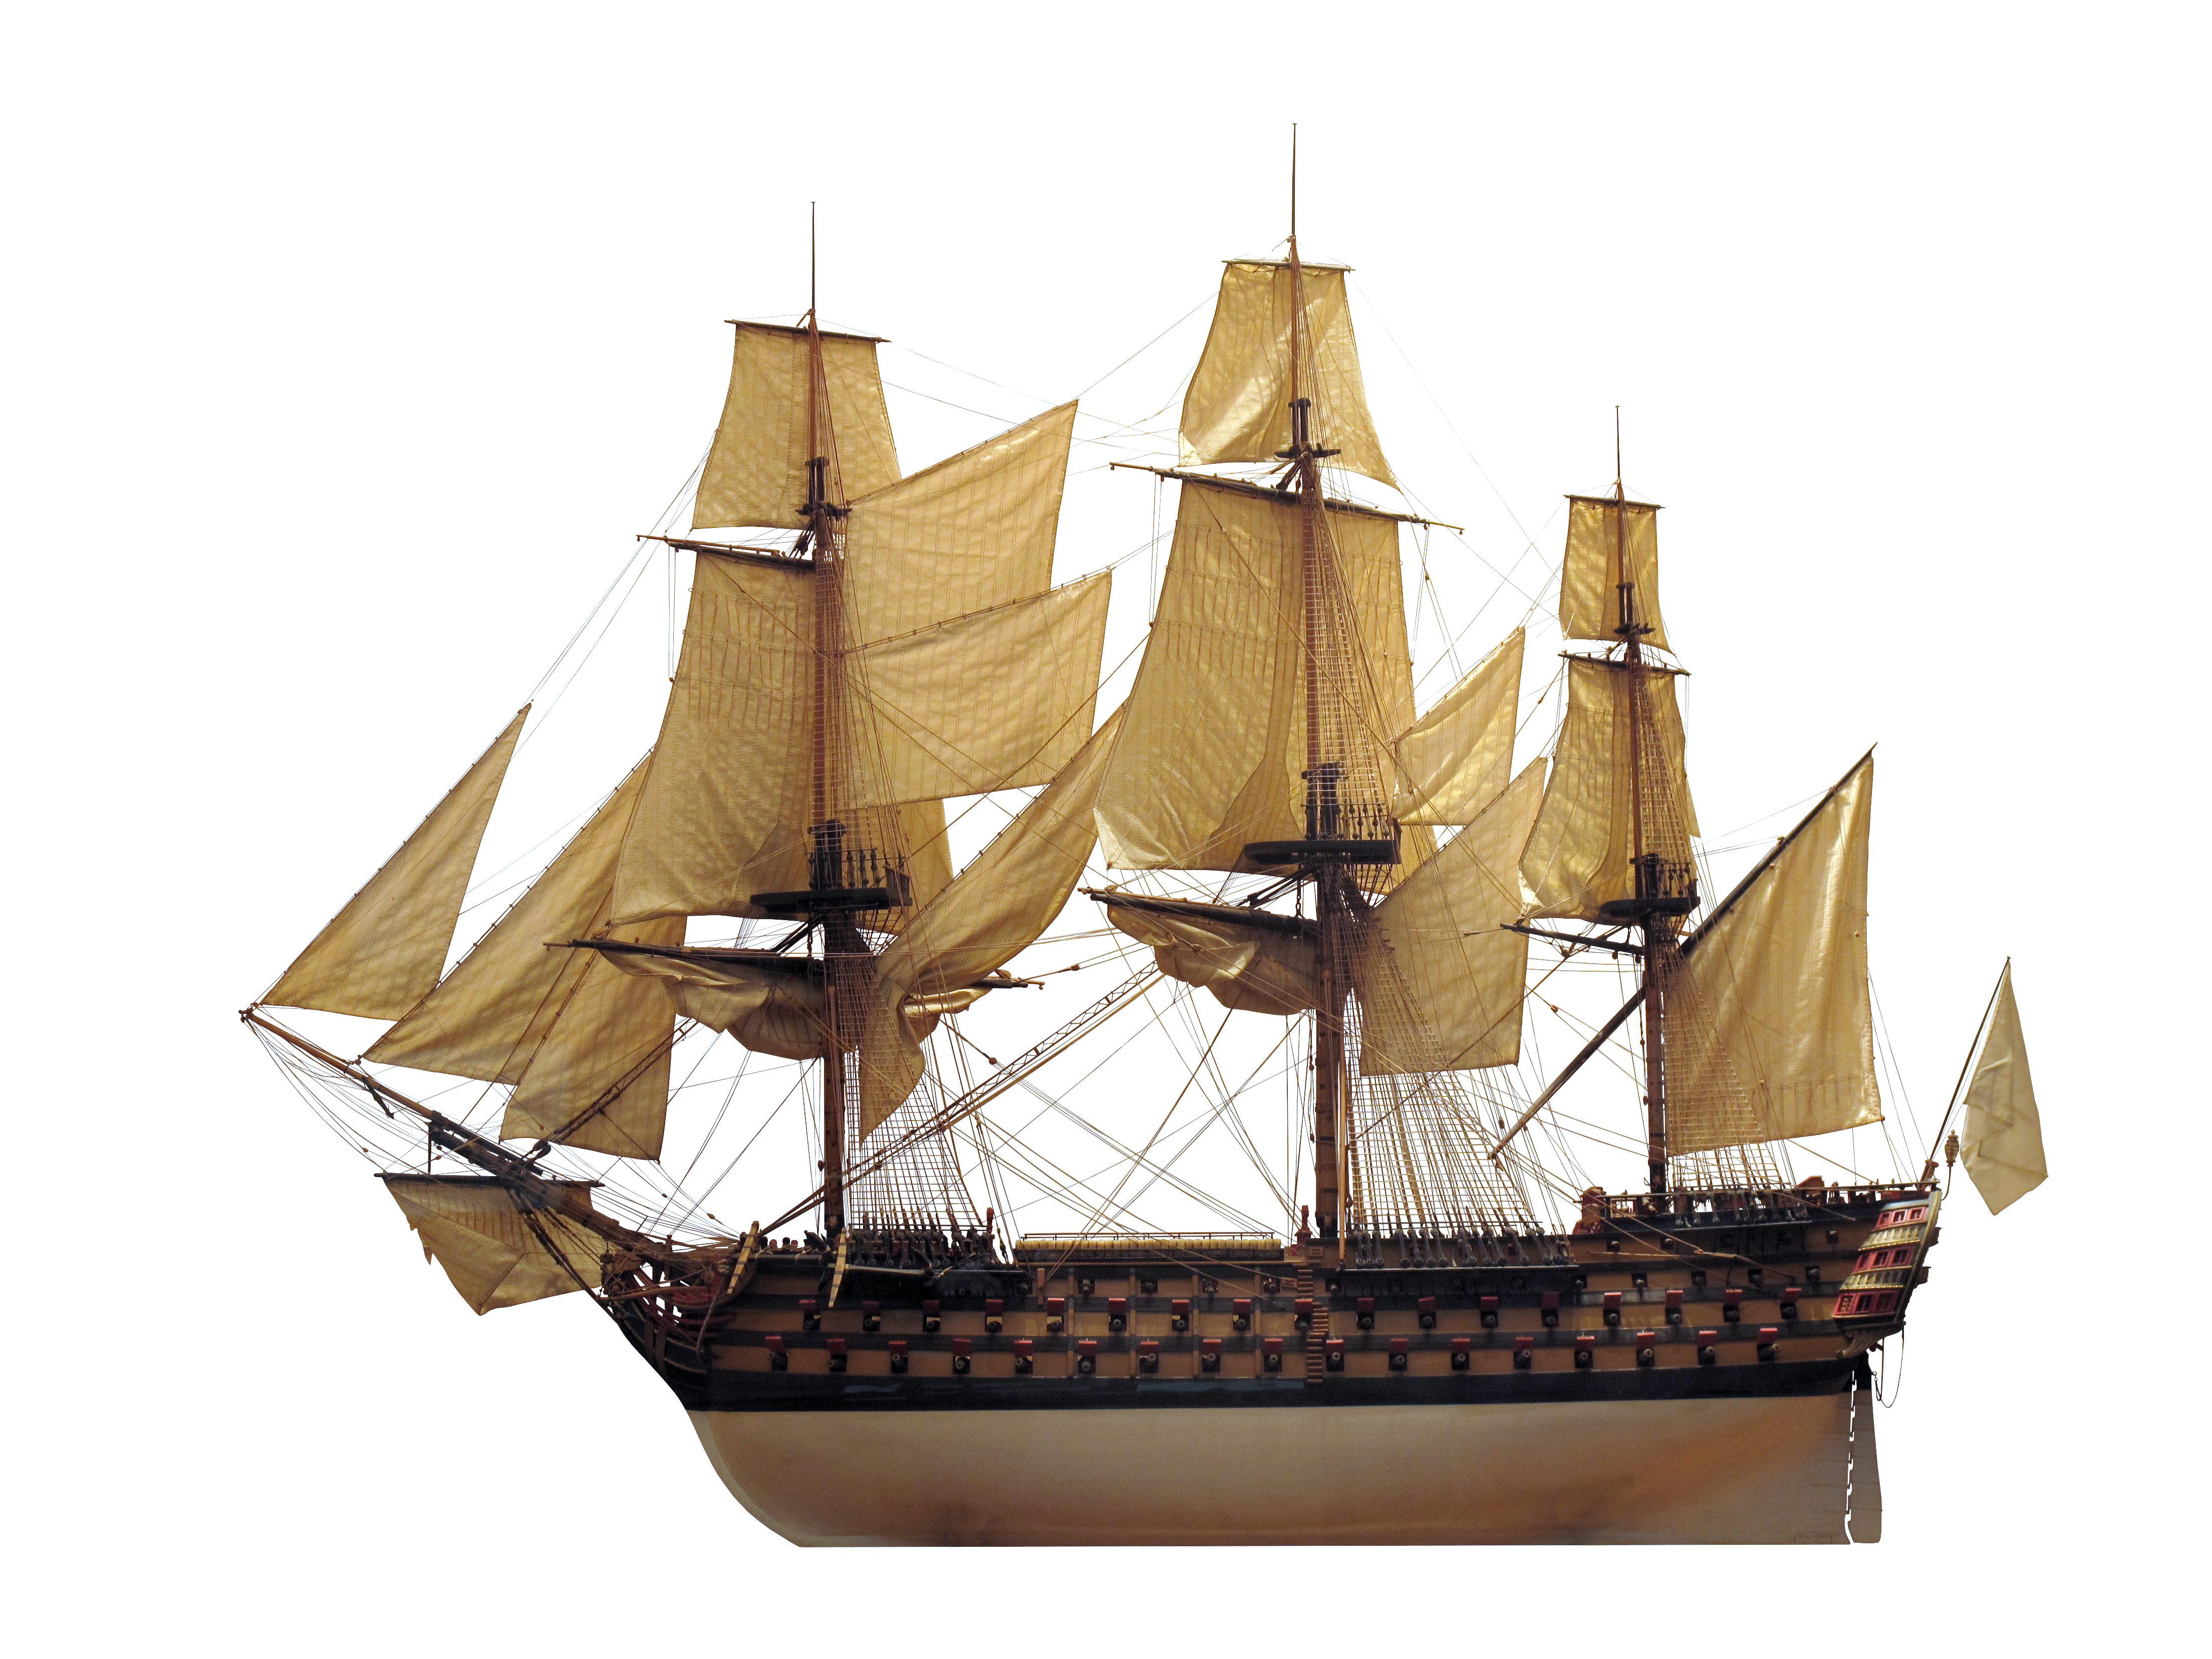 French ship roi de rome 1816 military wiki fandom for Chambre de commerce marseille horaires